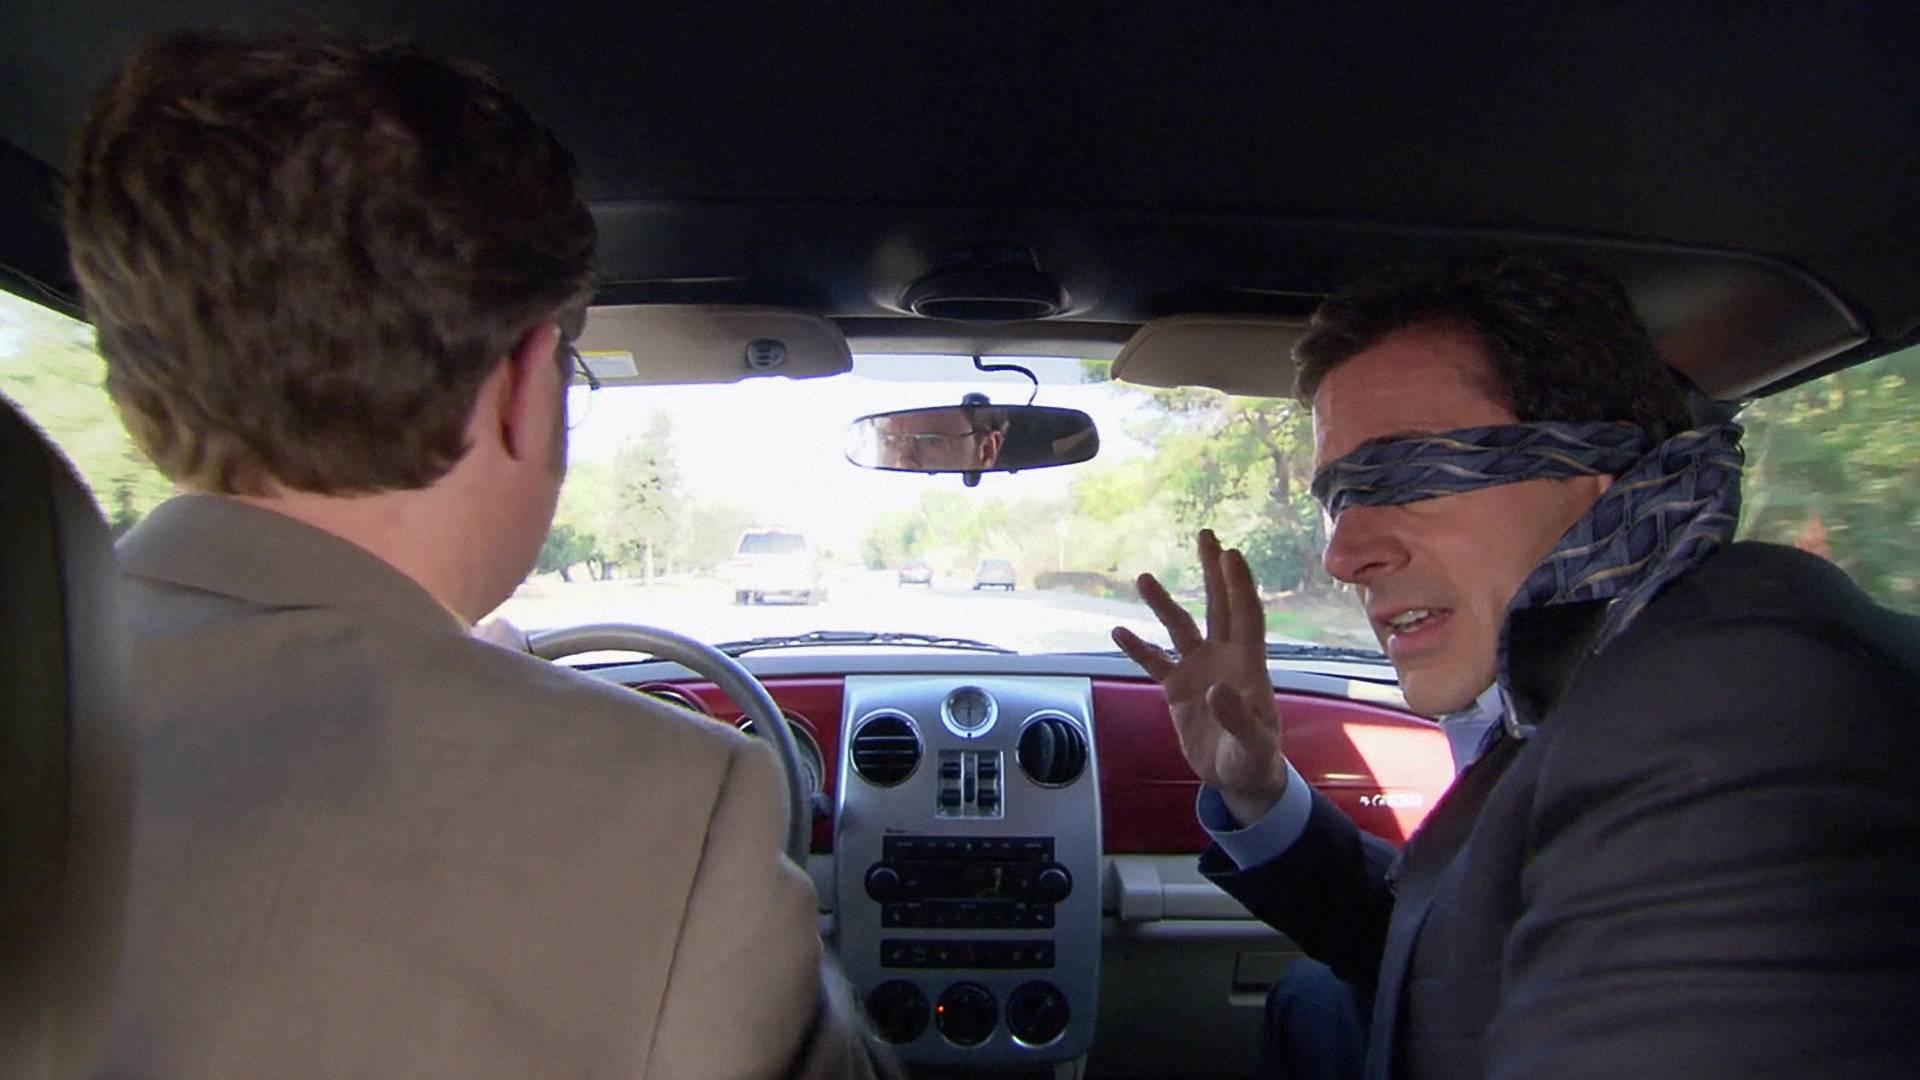 The Office Season 4 Episode 11